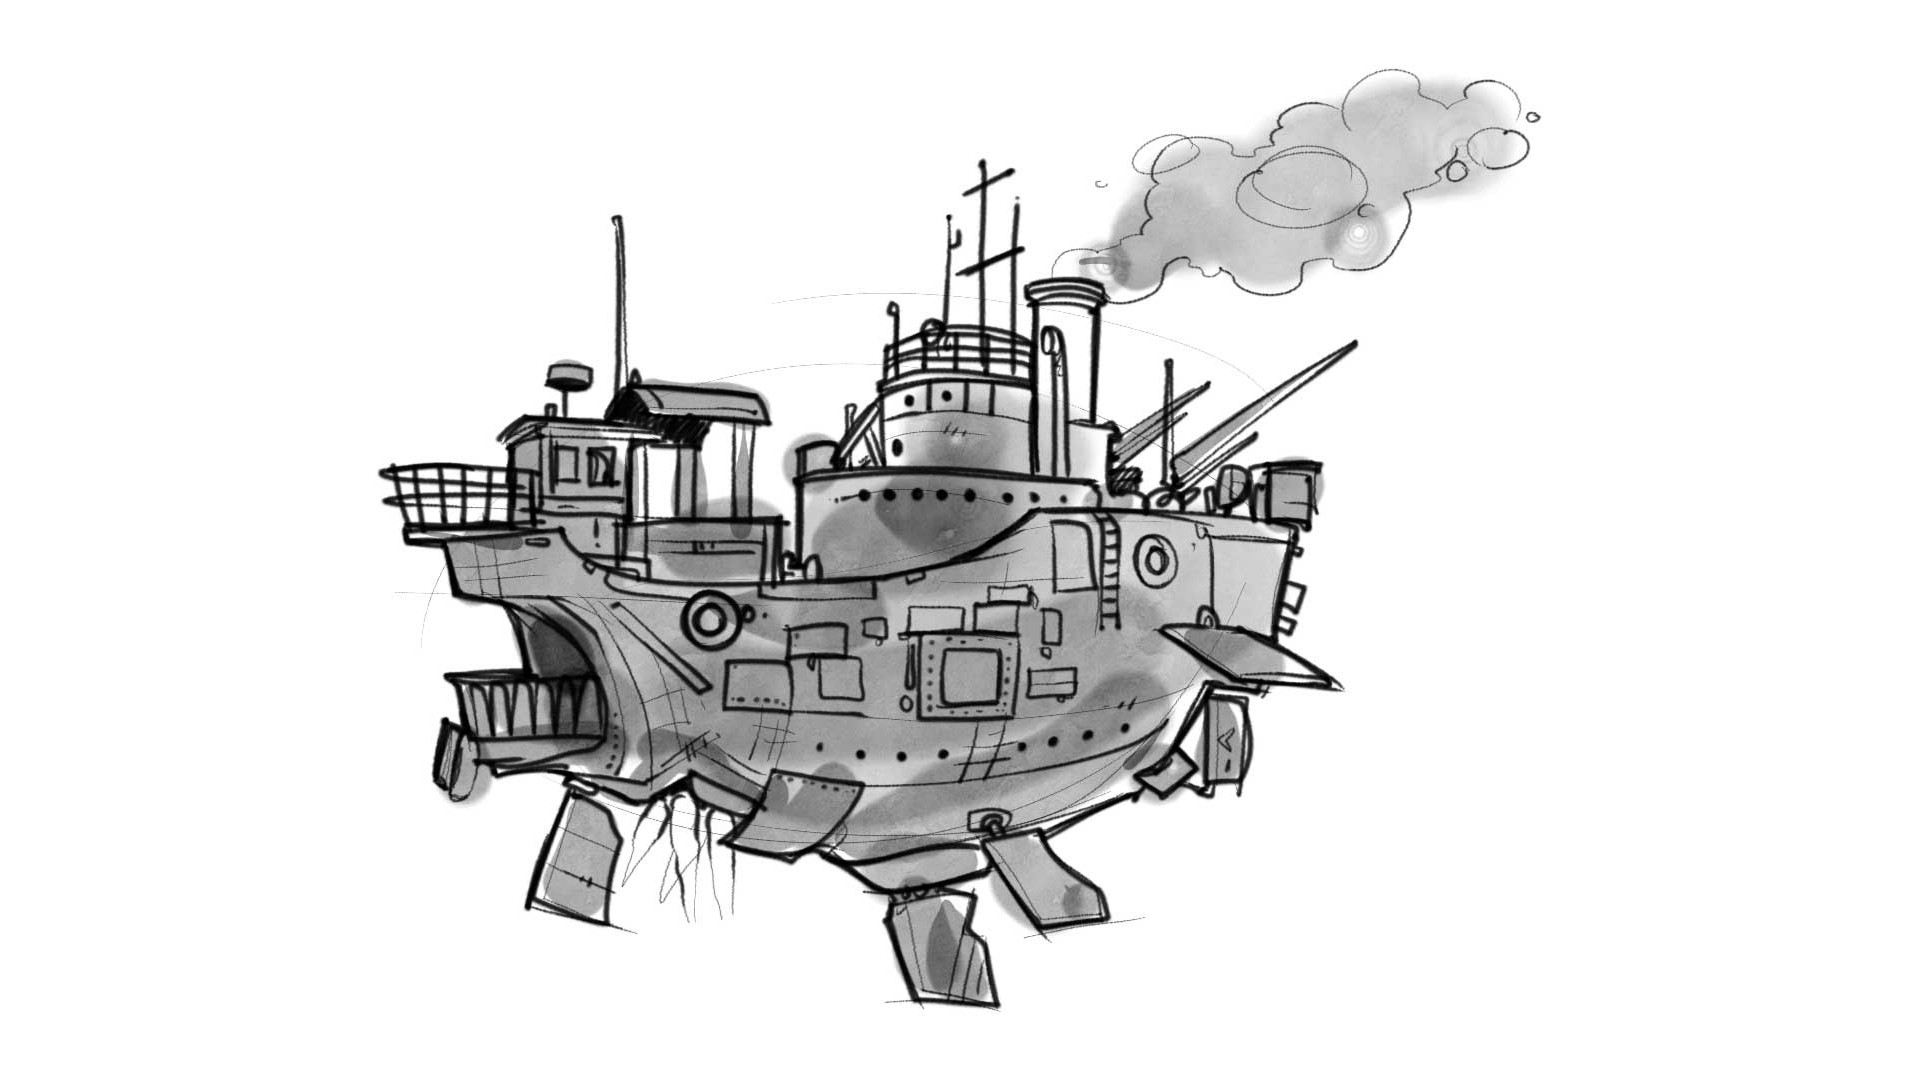 Soilwork Sketches